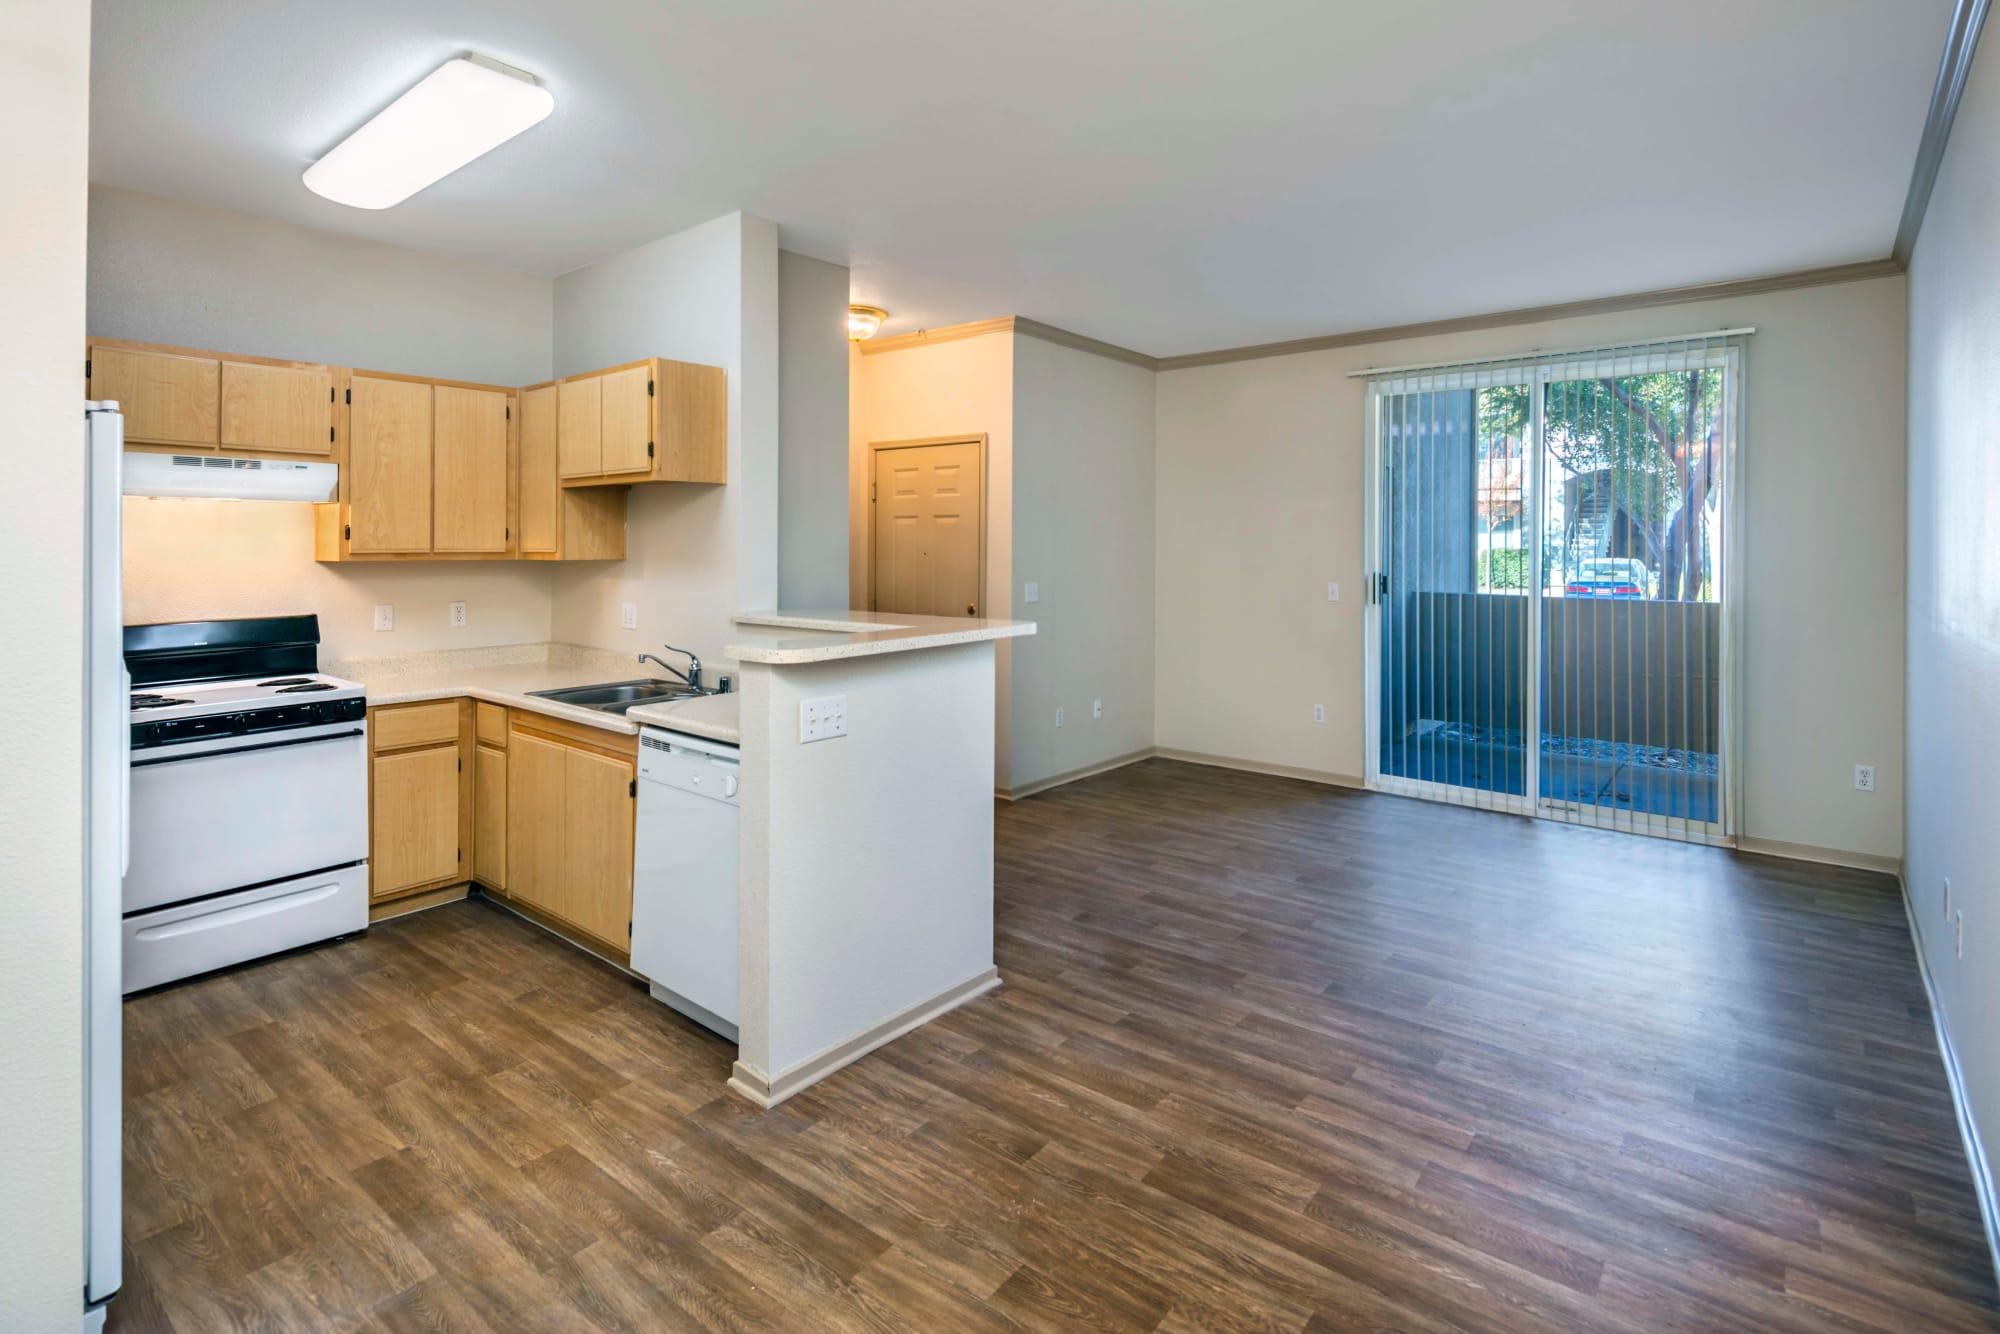 Beautiful hardwood floor room layout at Natomas Park Apartments in Sacramento, California